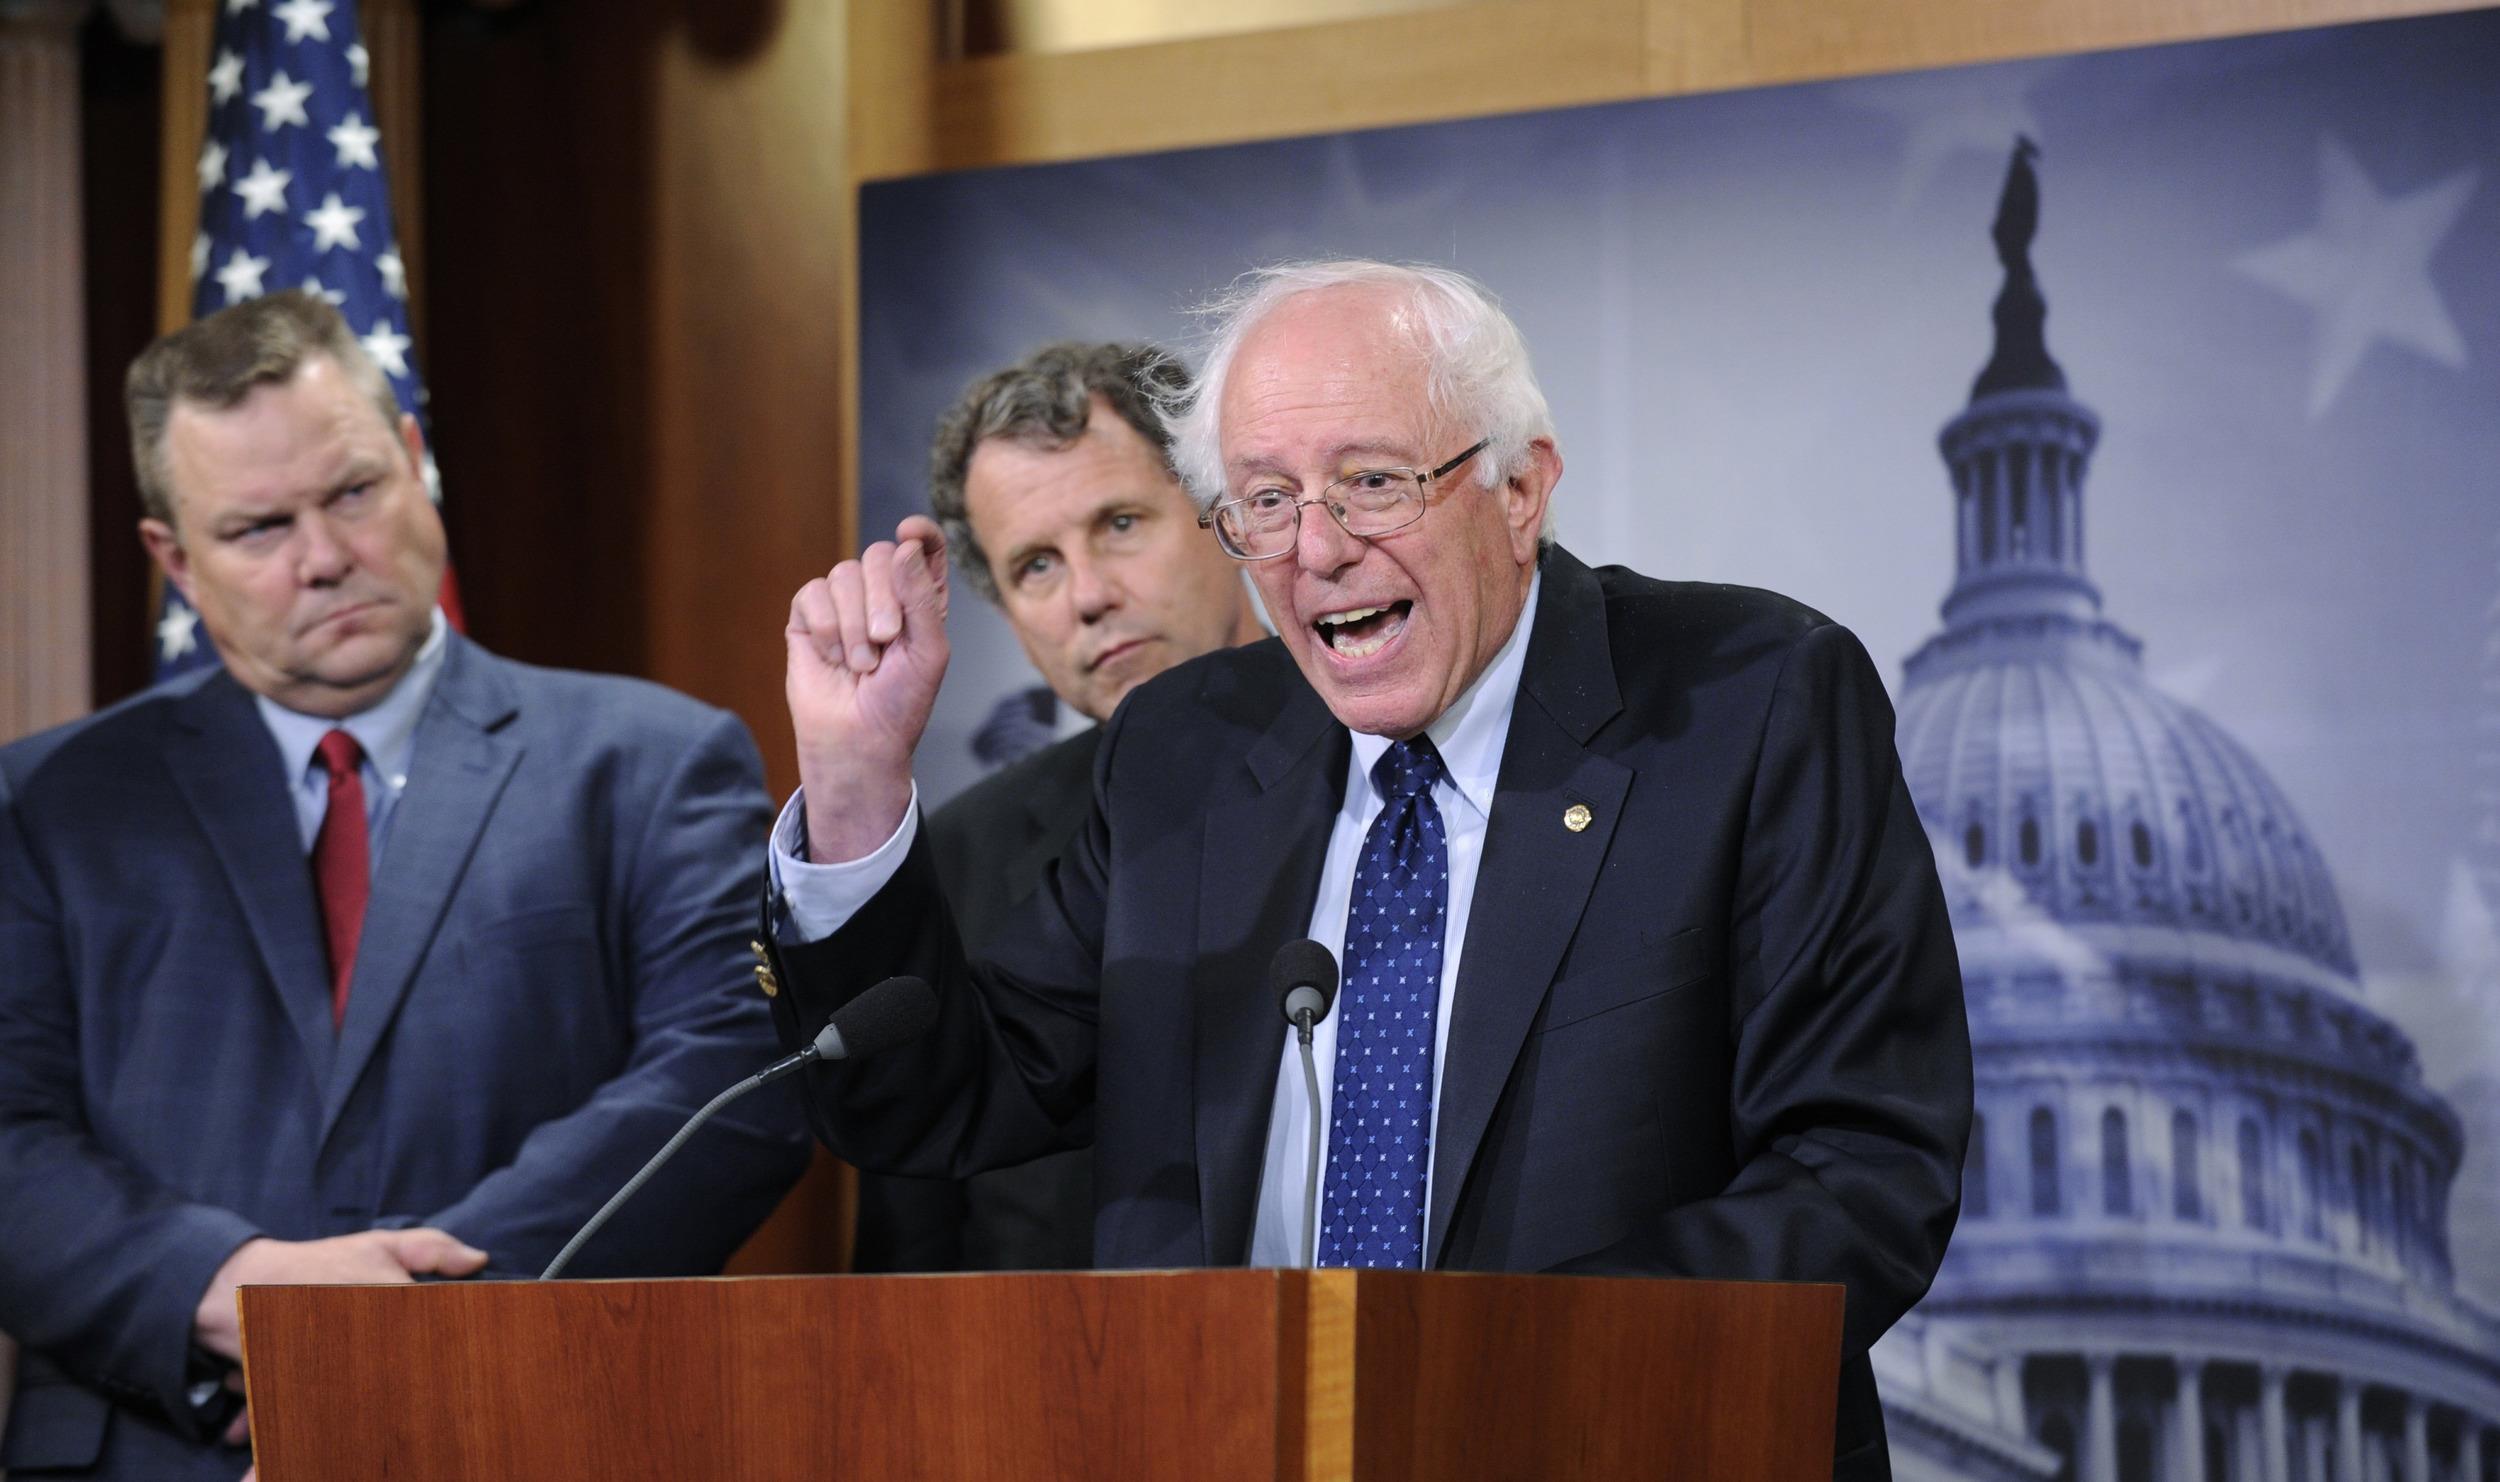 Image: Bernie Sanders, Jon Tester, Sherrod Brown